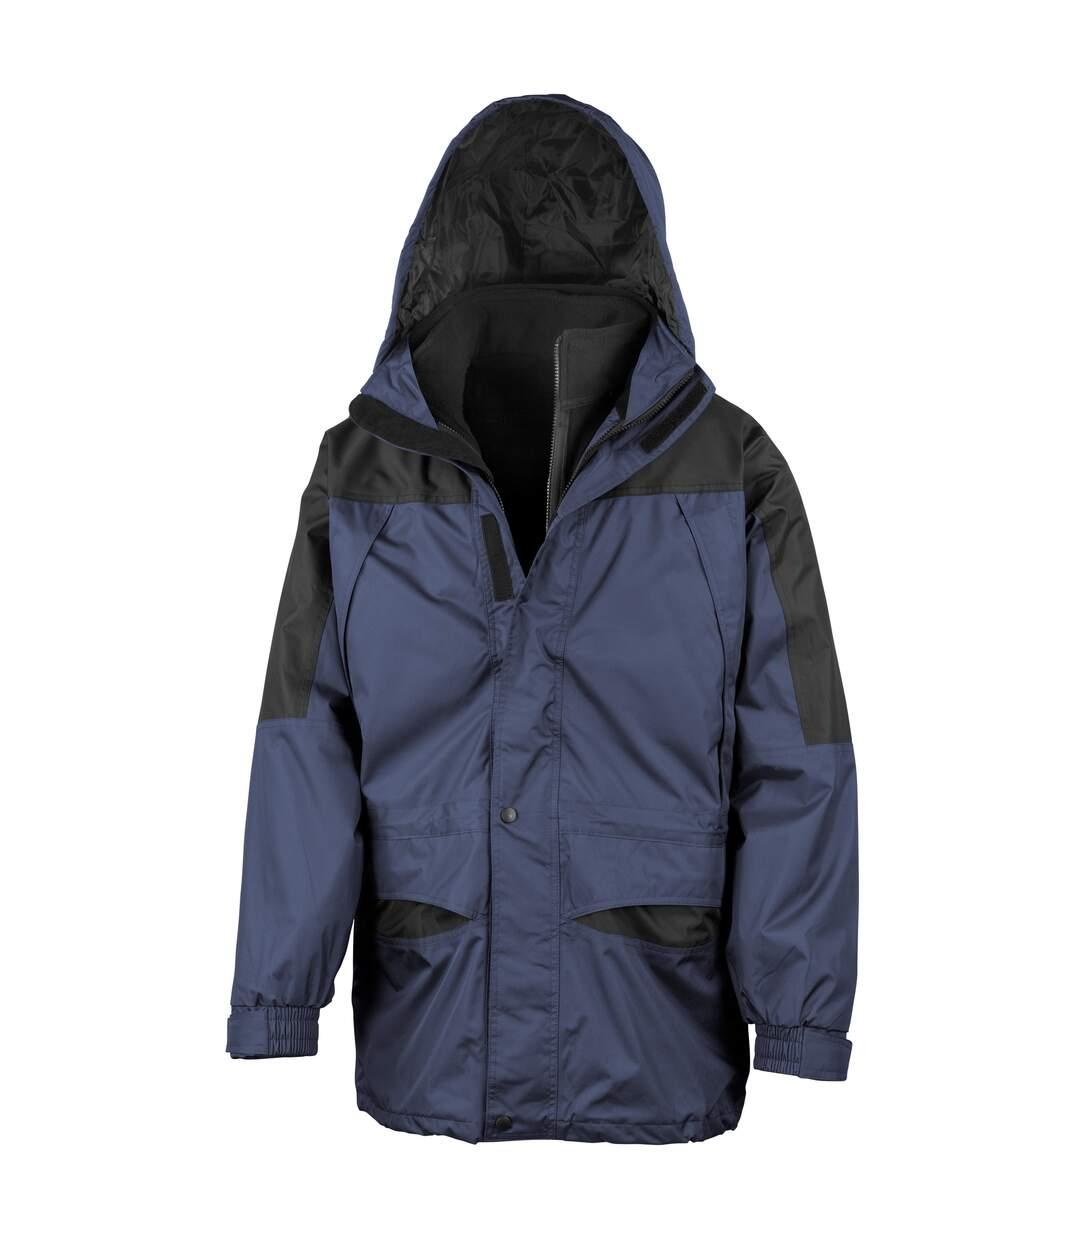 Result Mens Alaska 3-in-1 StormDri Waterproof Windproof Jacket (Navy/Black) - UTBC941